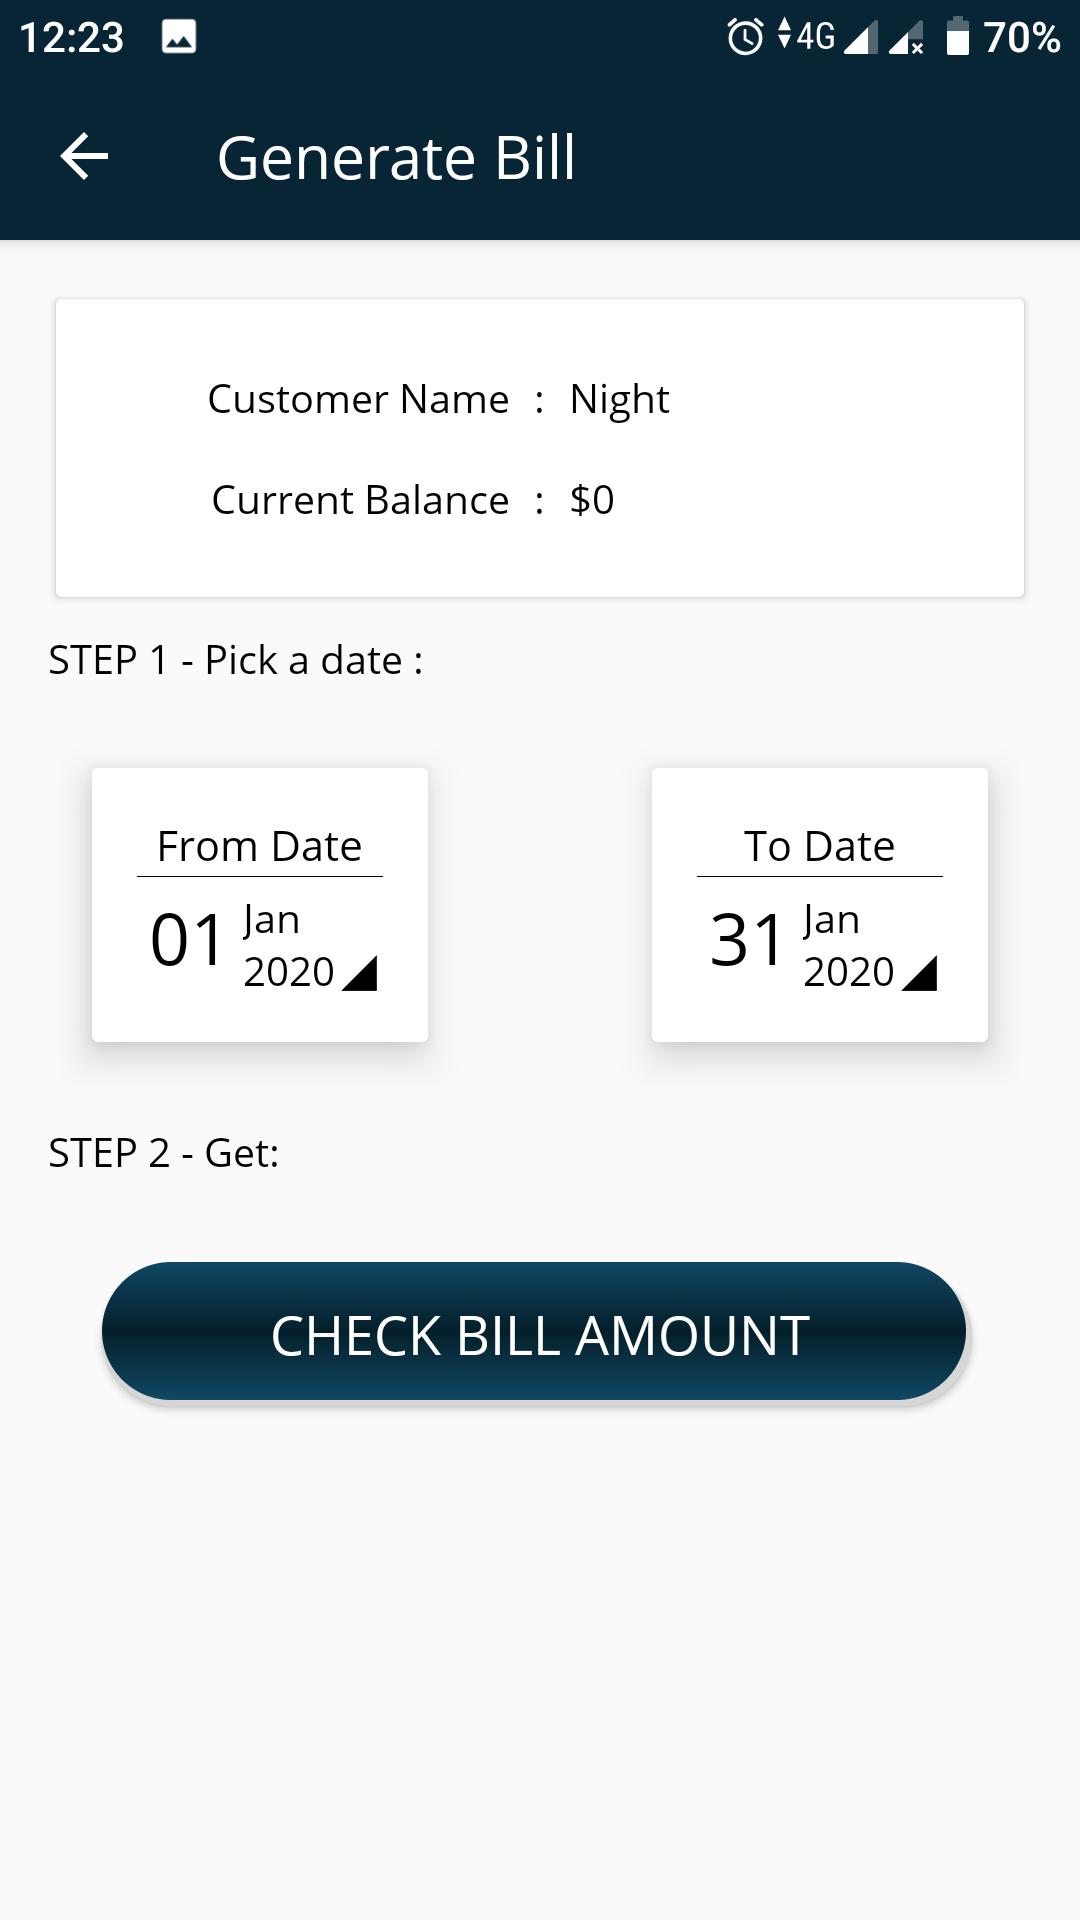 Generate Bill